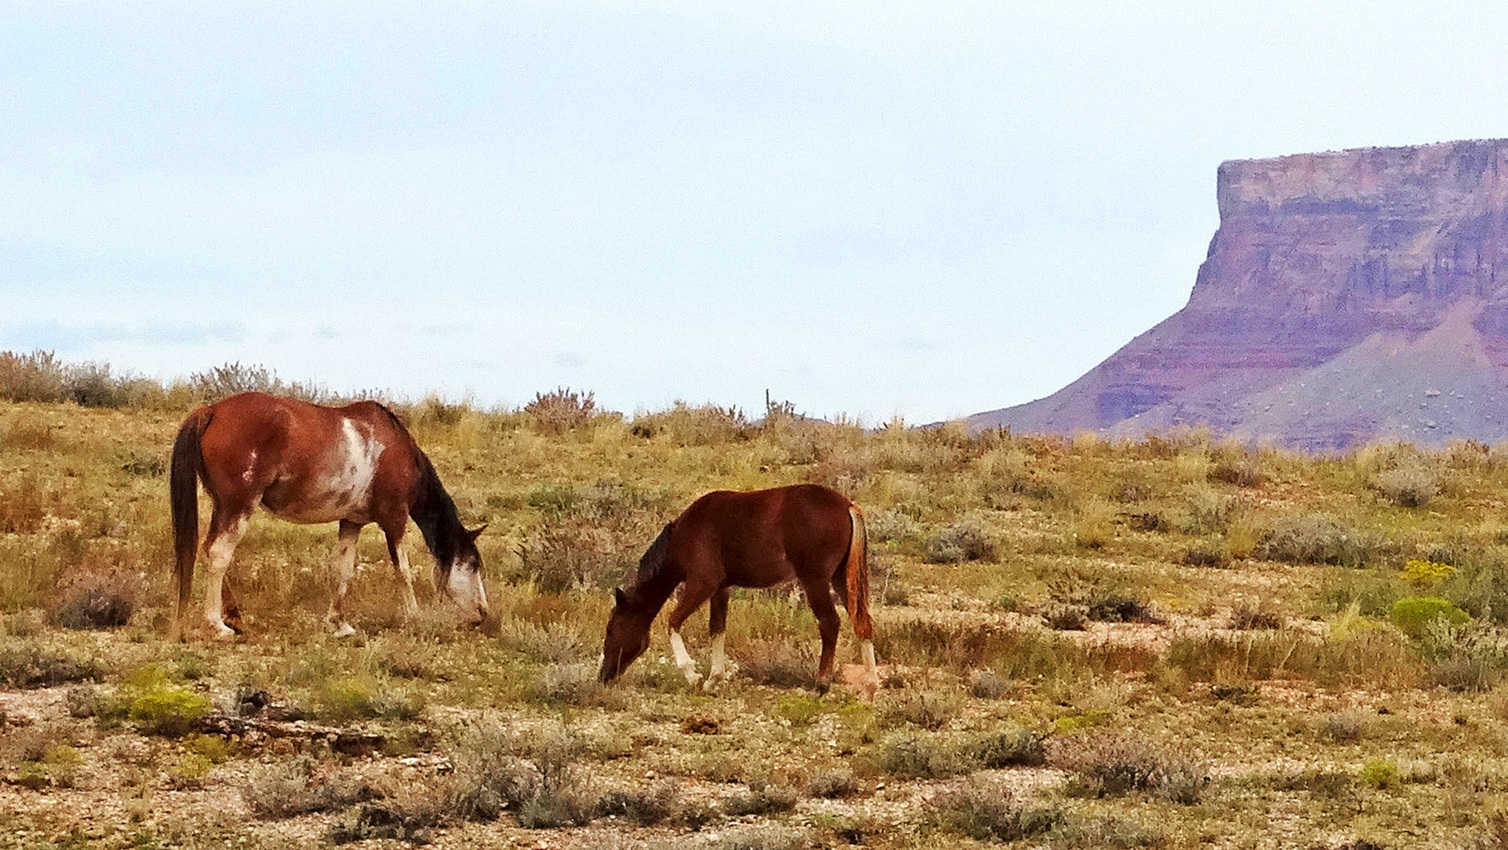 Ponies in Northern Arizona. Don Graham photo.